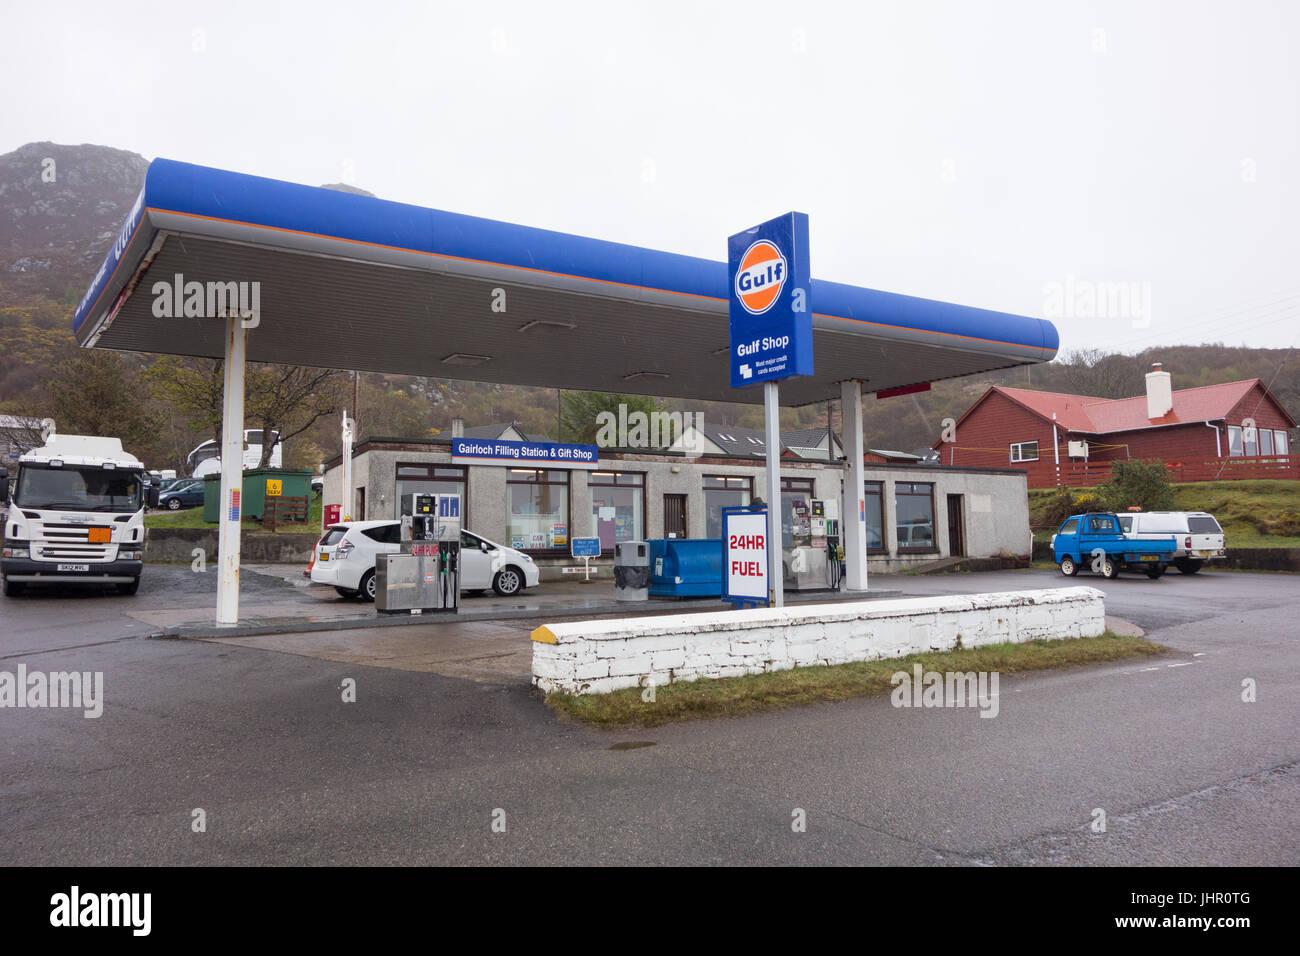 Gulf Tankstelle, Gairloch, Scotland, UK Stockbild